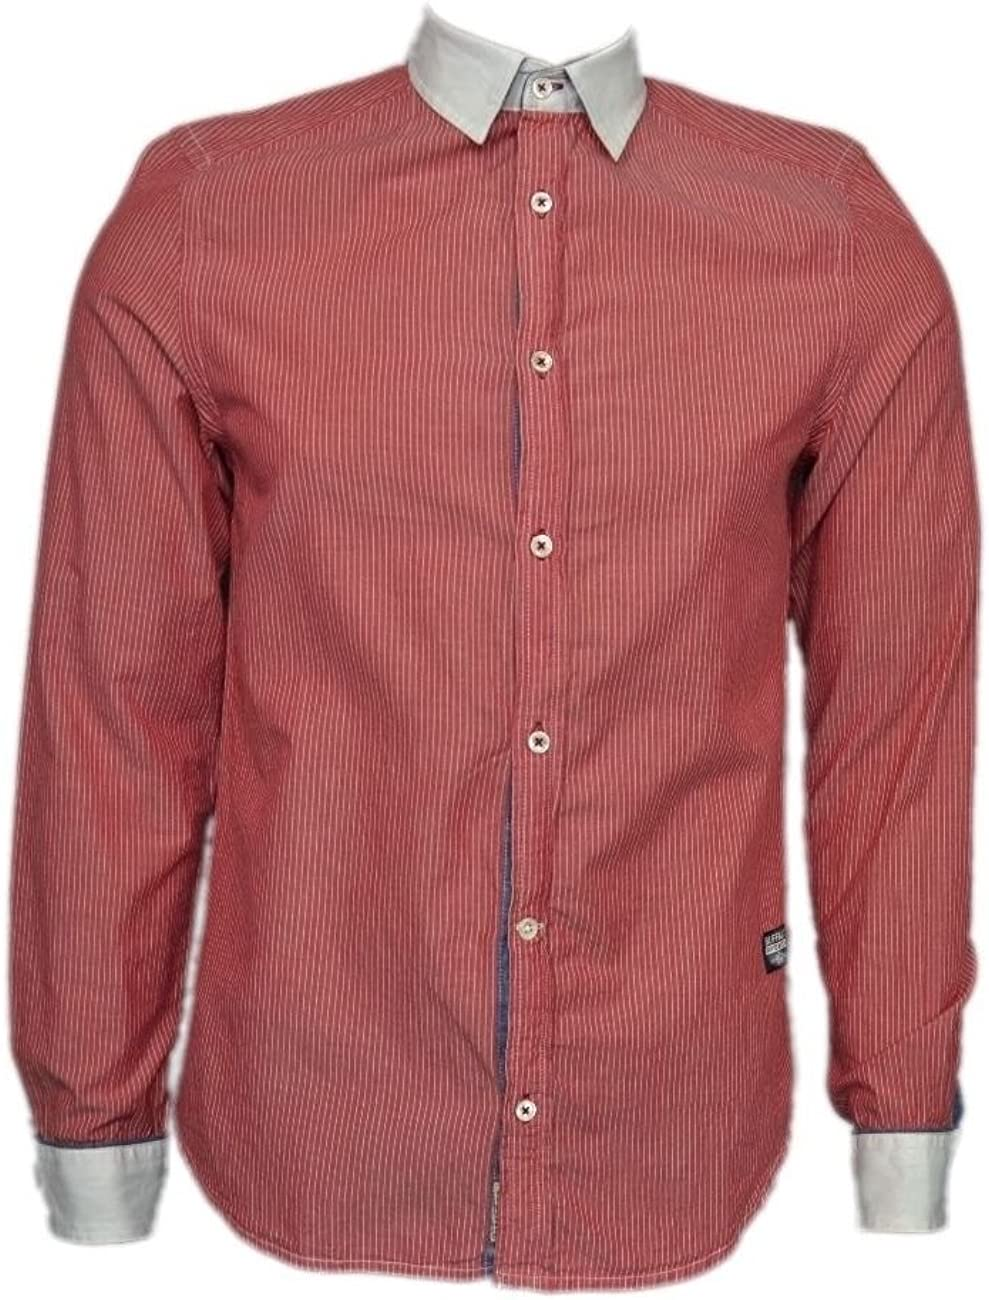 Buffalo David Bitton Men's Red/White Simov Striped Long Sleeve Button Down Shirt Size Small